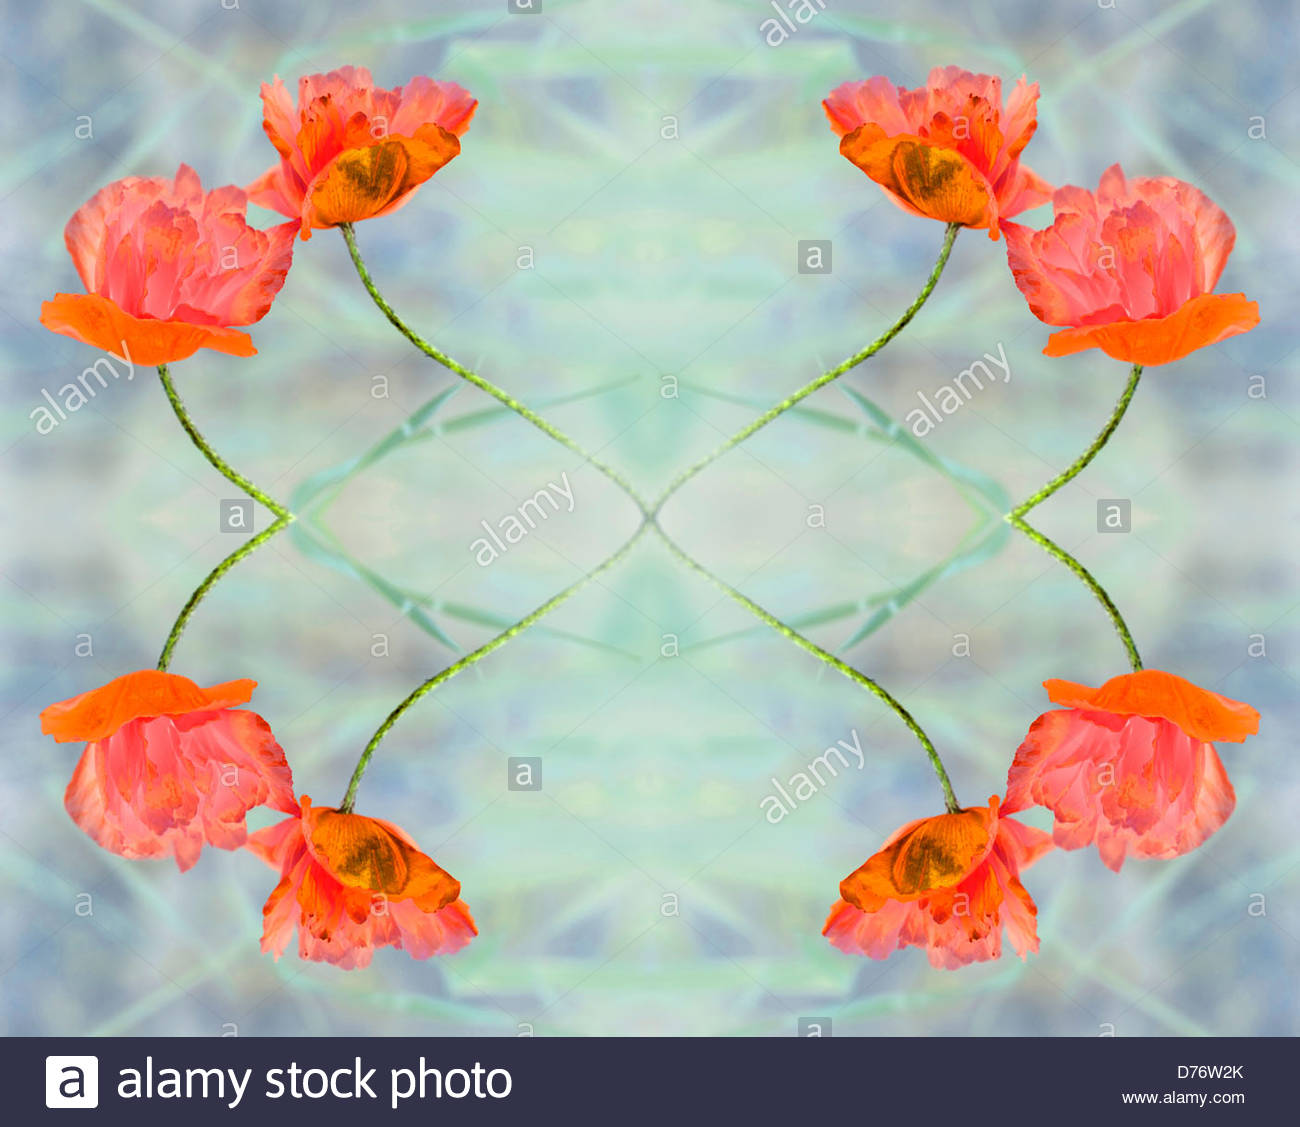 Red poppy flowers - Stock Image